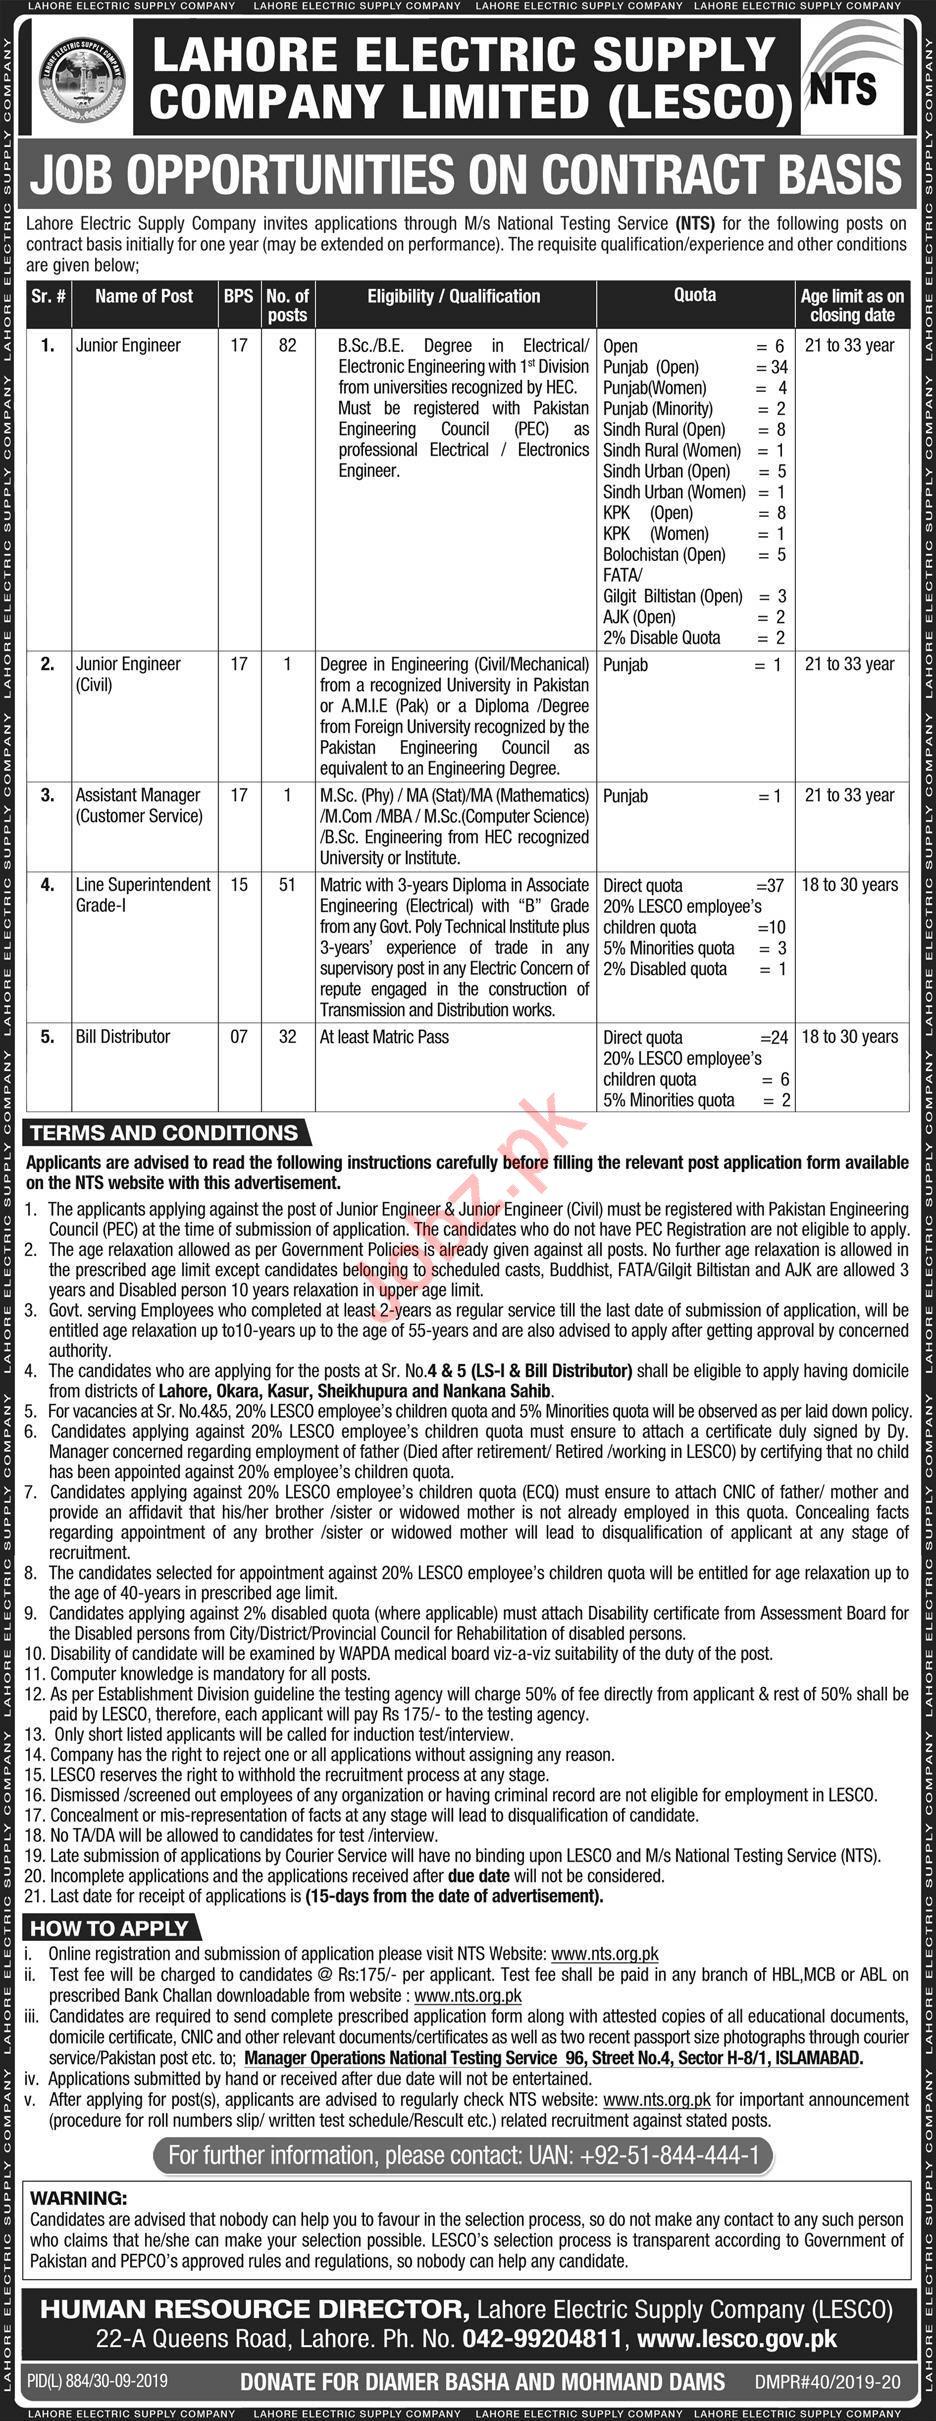 Lahore Electric Supply Company LESCO Jobs Via NTS